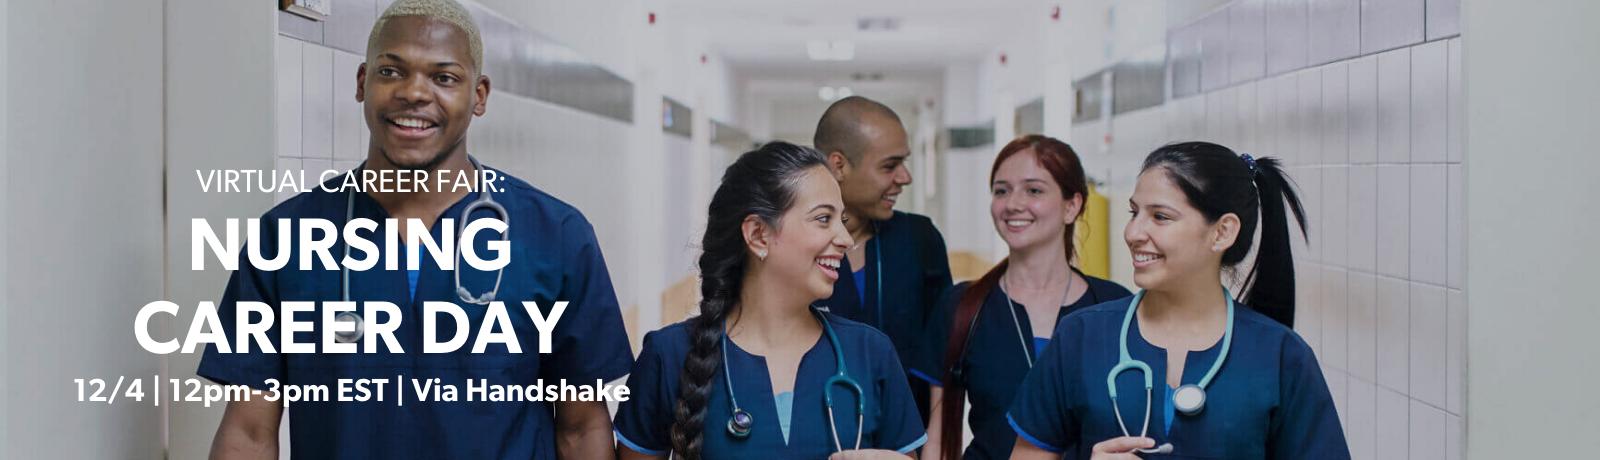 Virtual Career Fair: Nursing Career Day, 12/4 12pm-3pm via Handshake